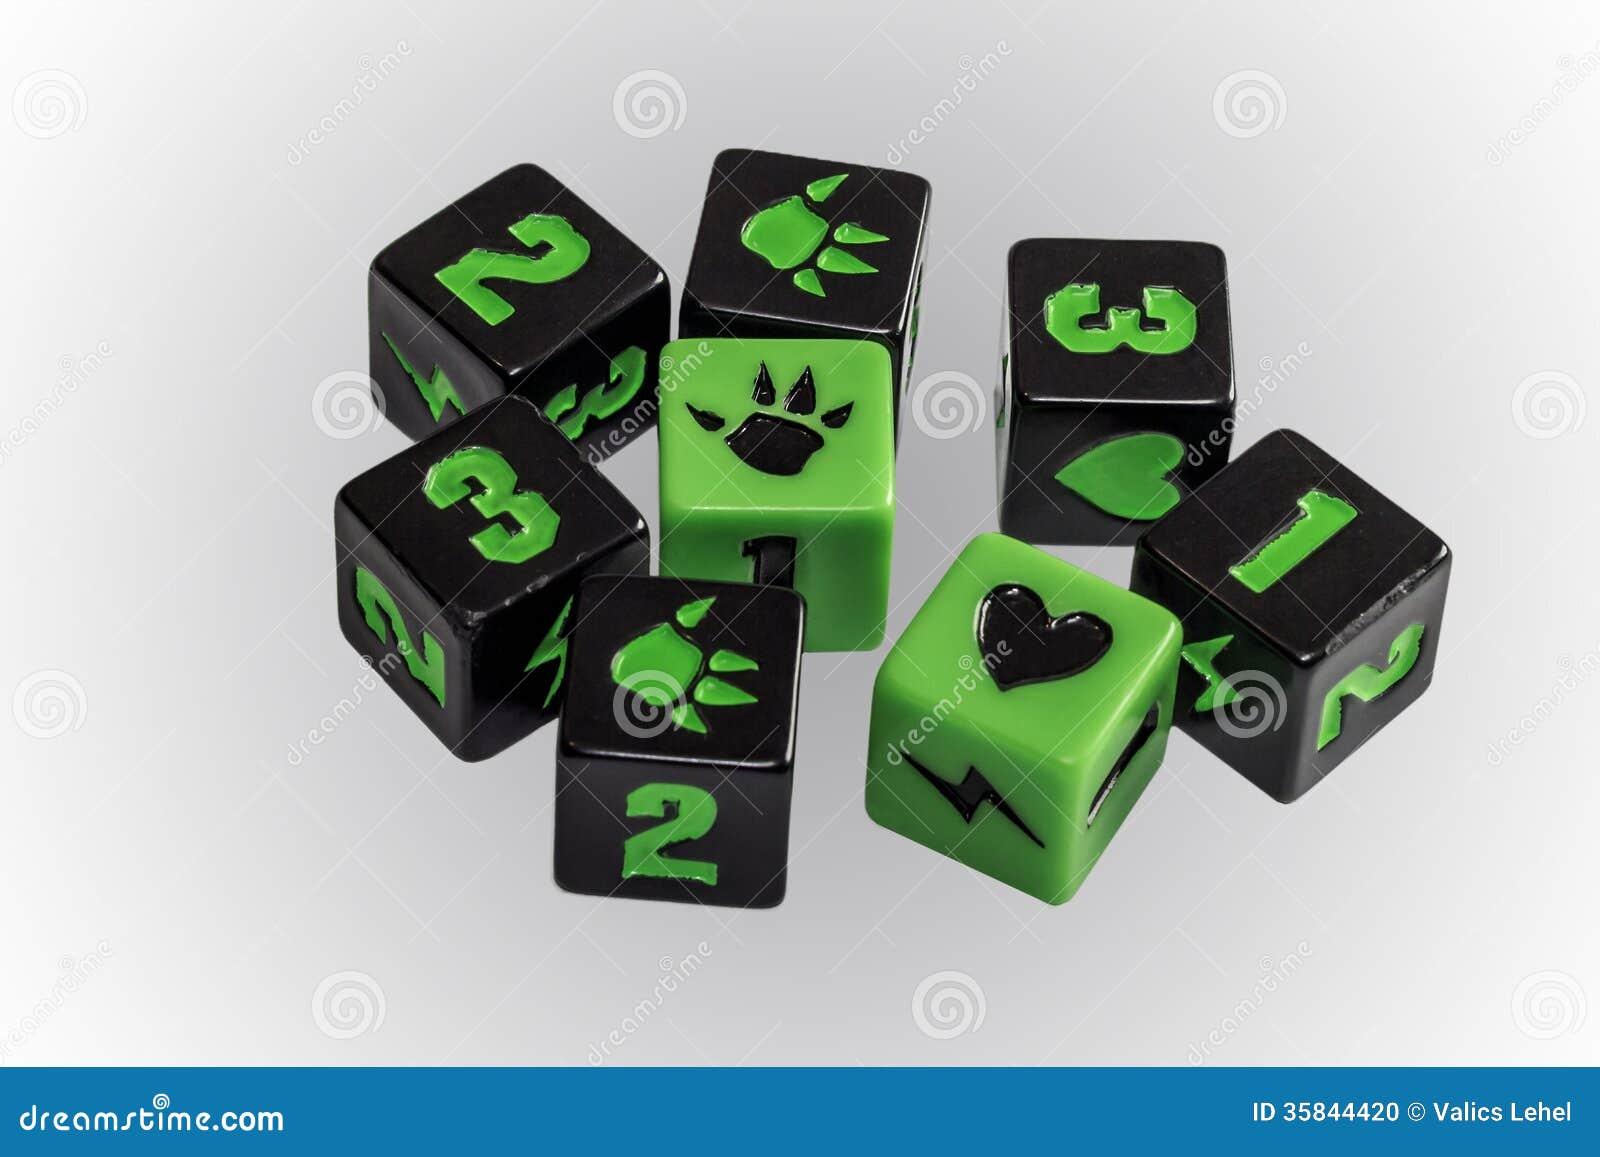 Craps game board